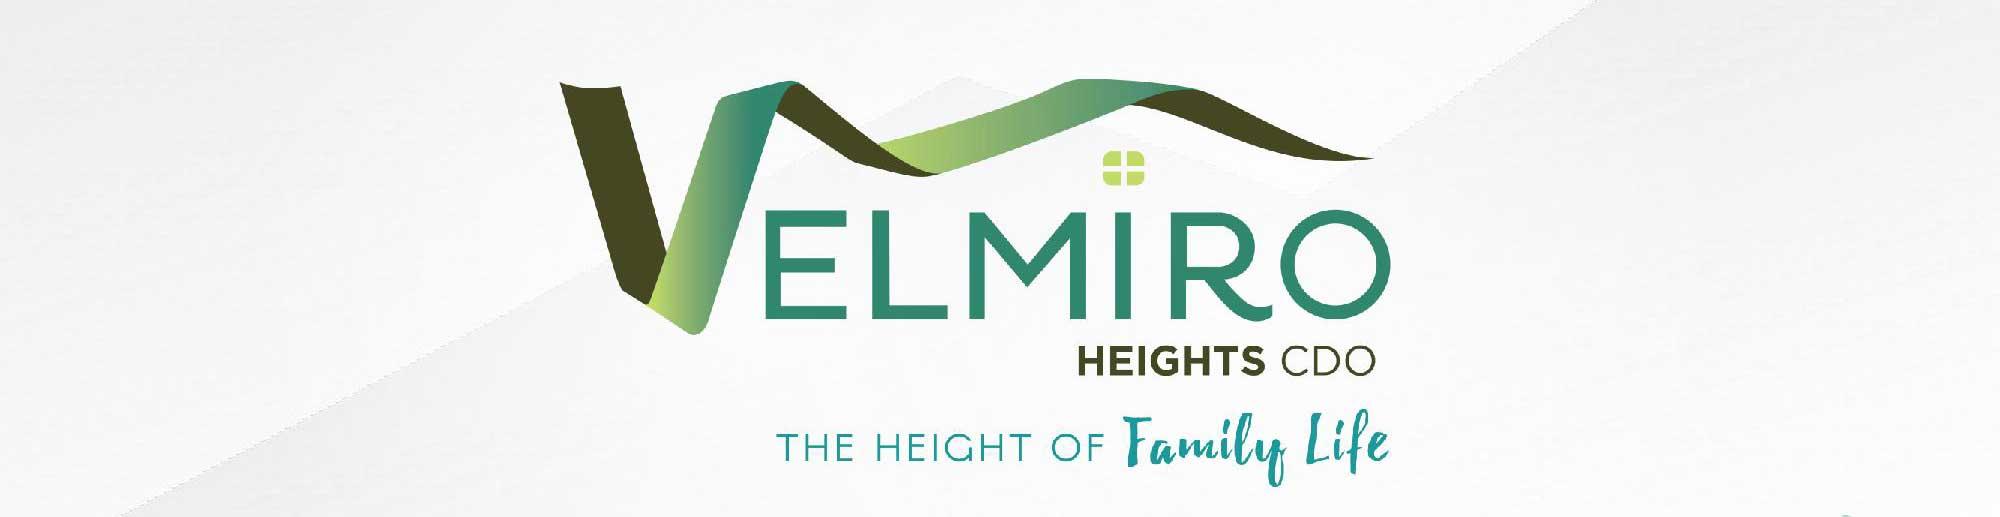 Velmiro heights agusan web gmc